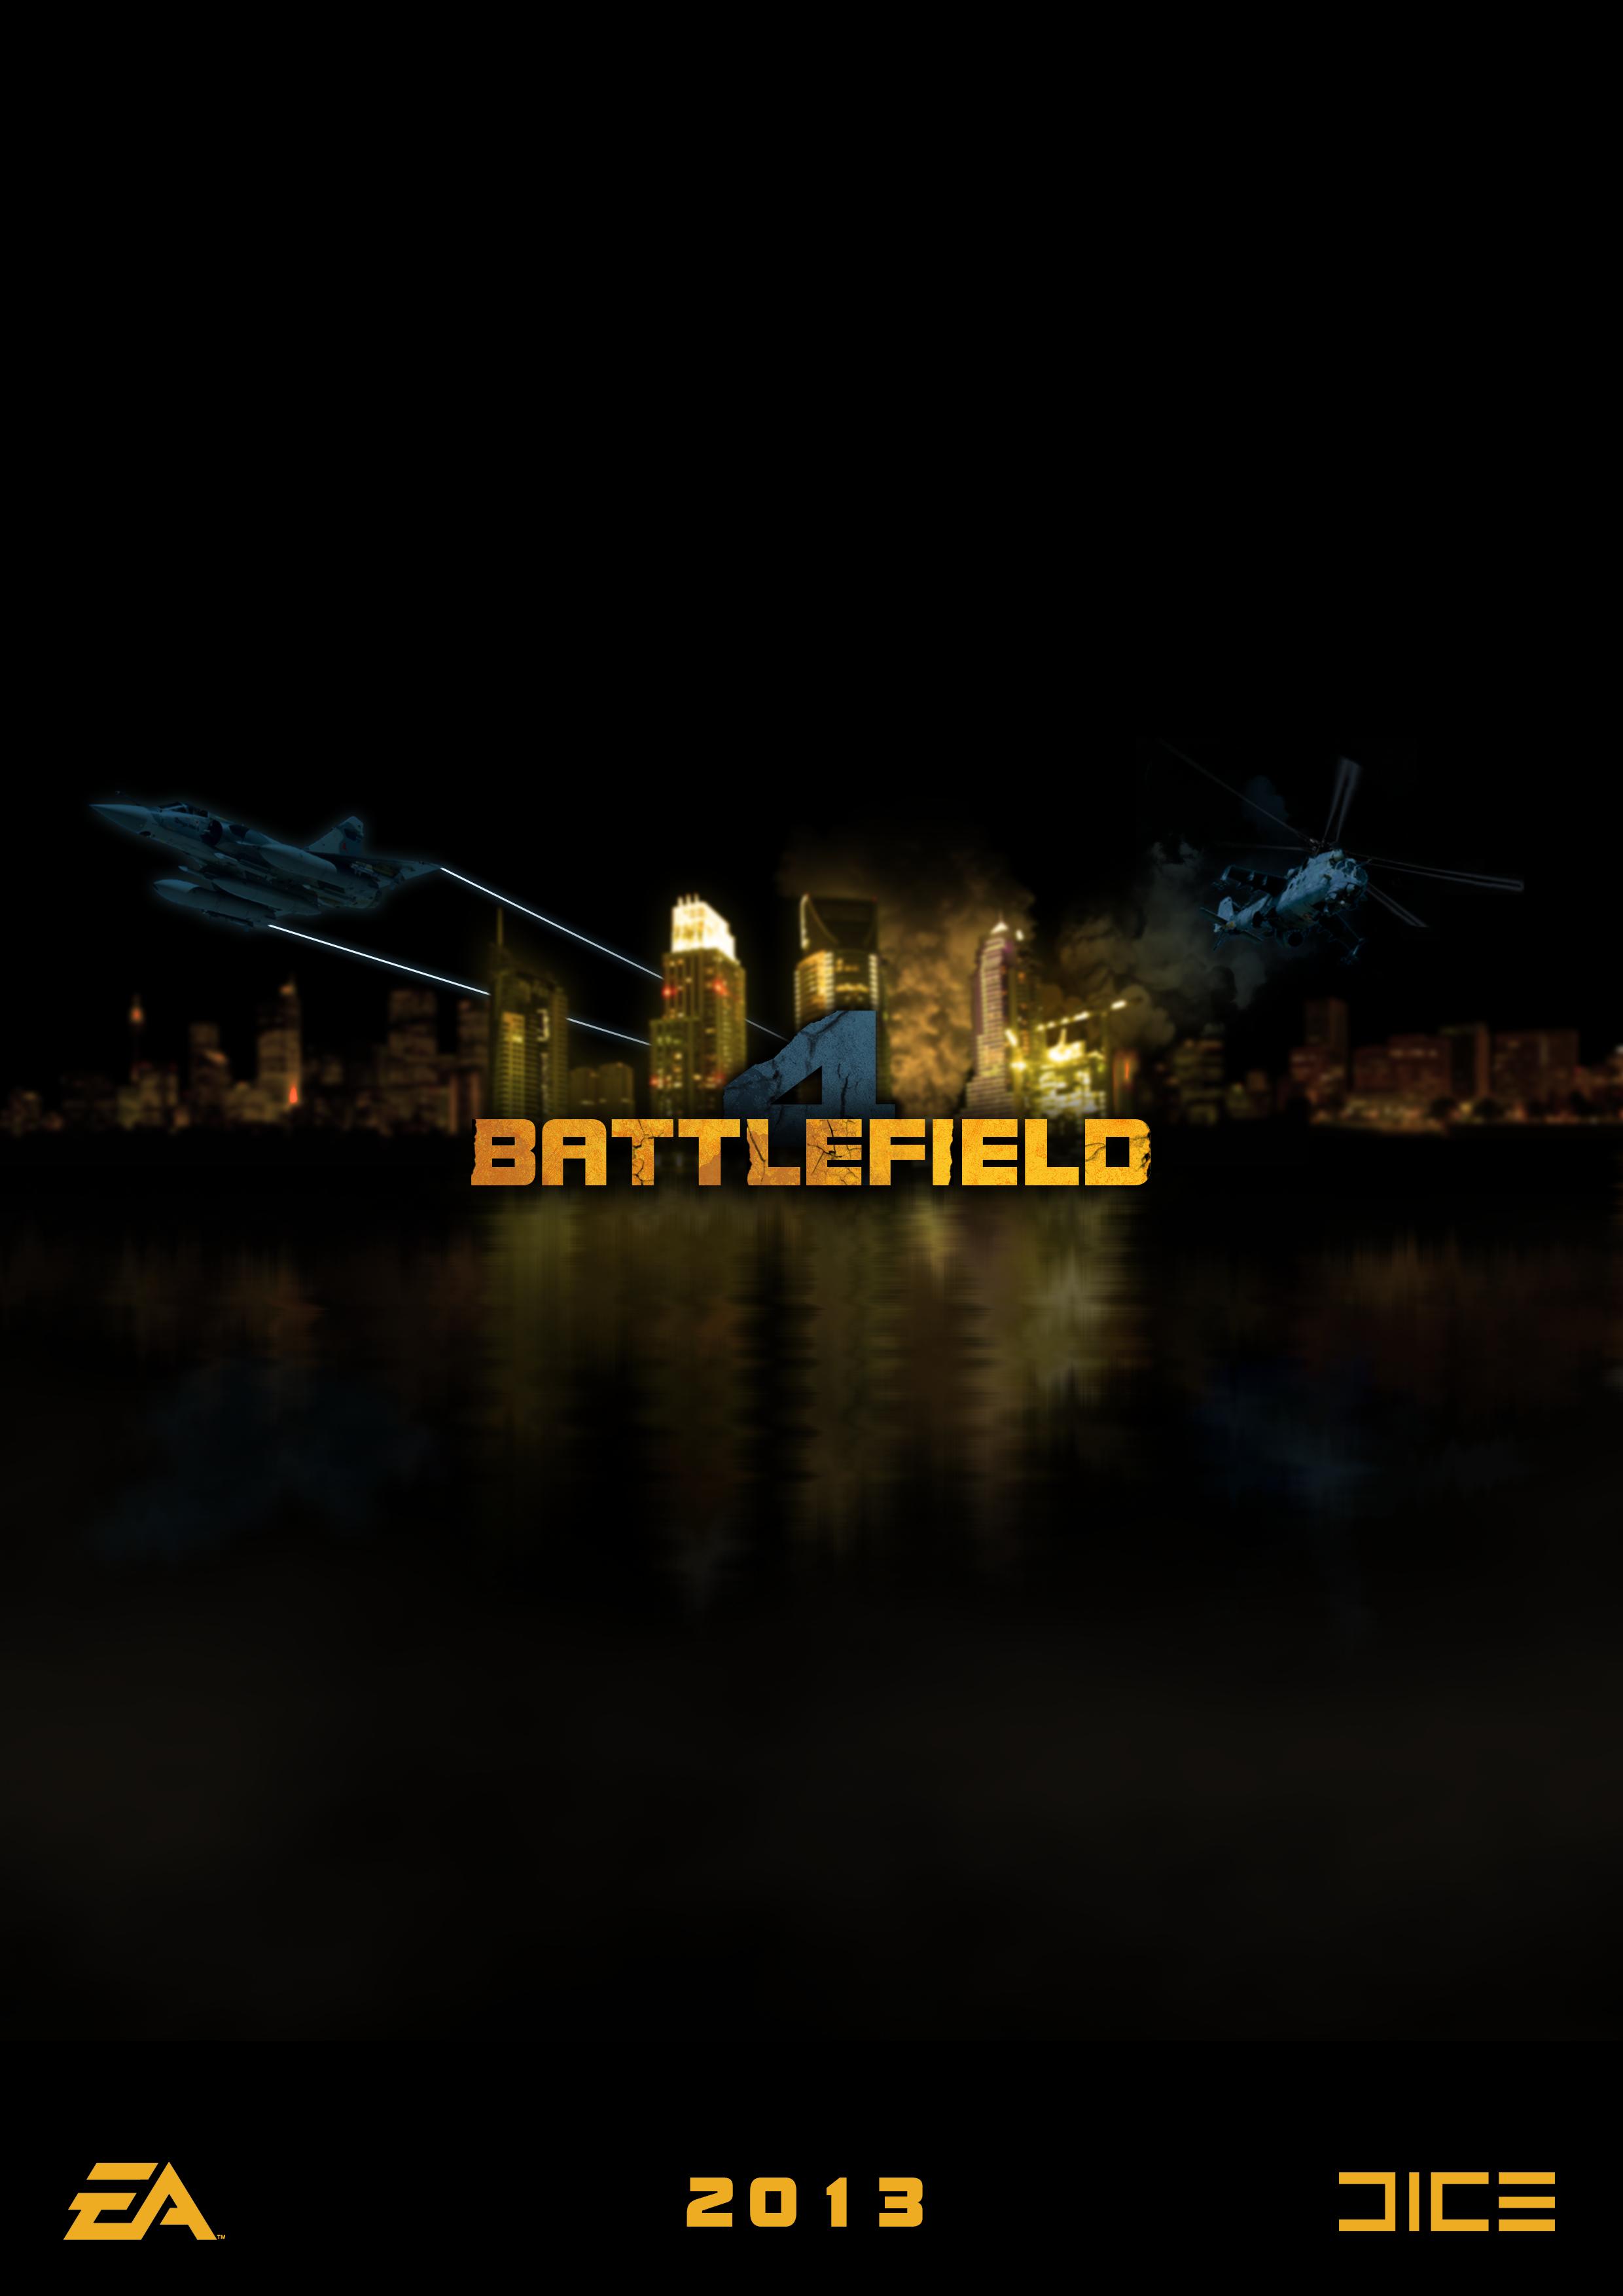 Battlefield 4 Teaser Poster by CrustyDog